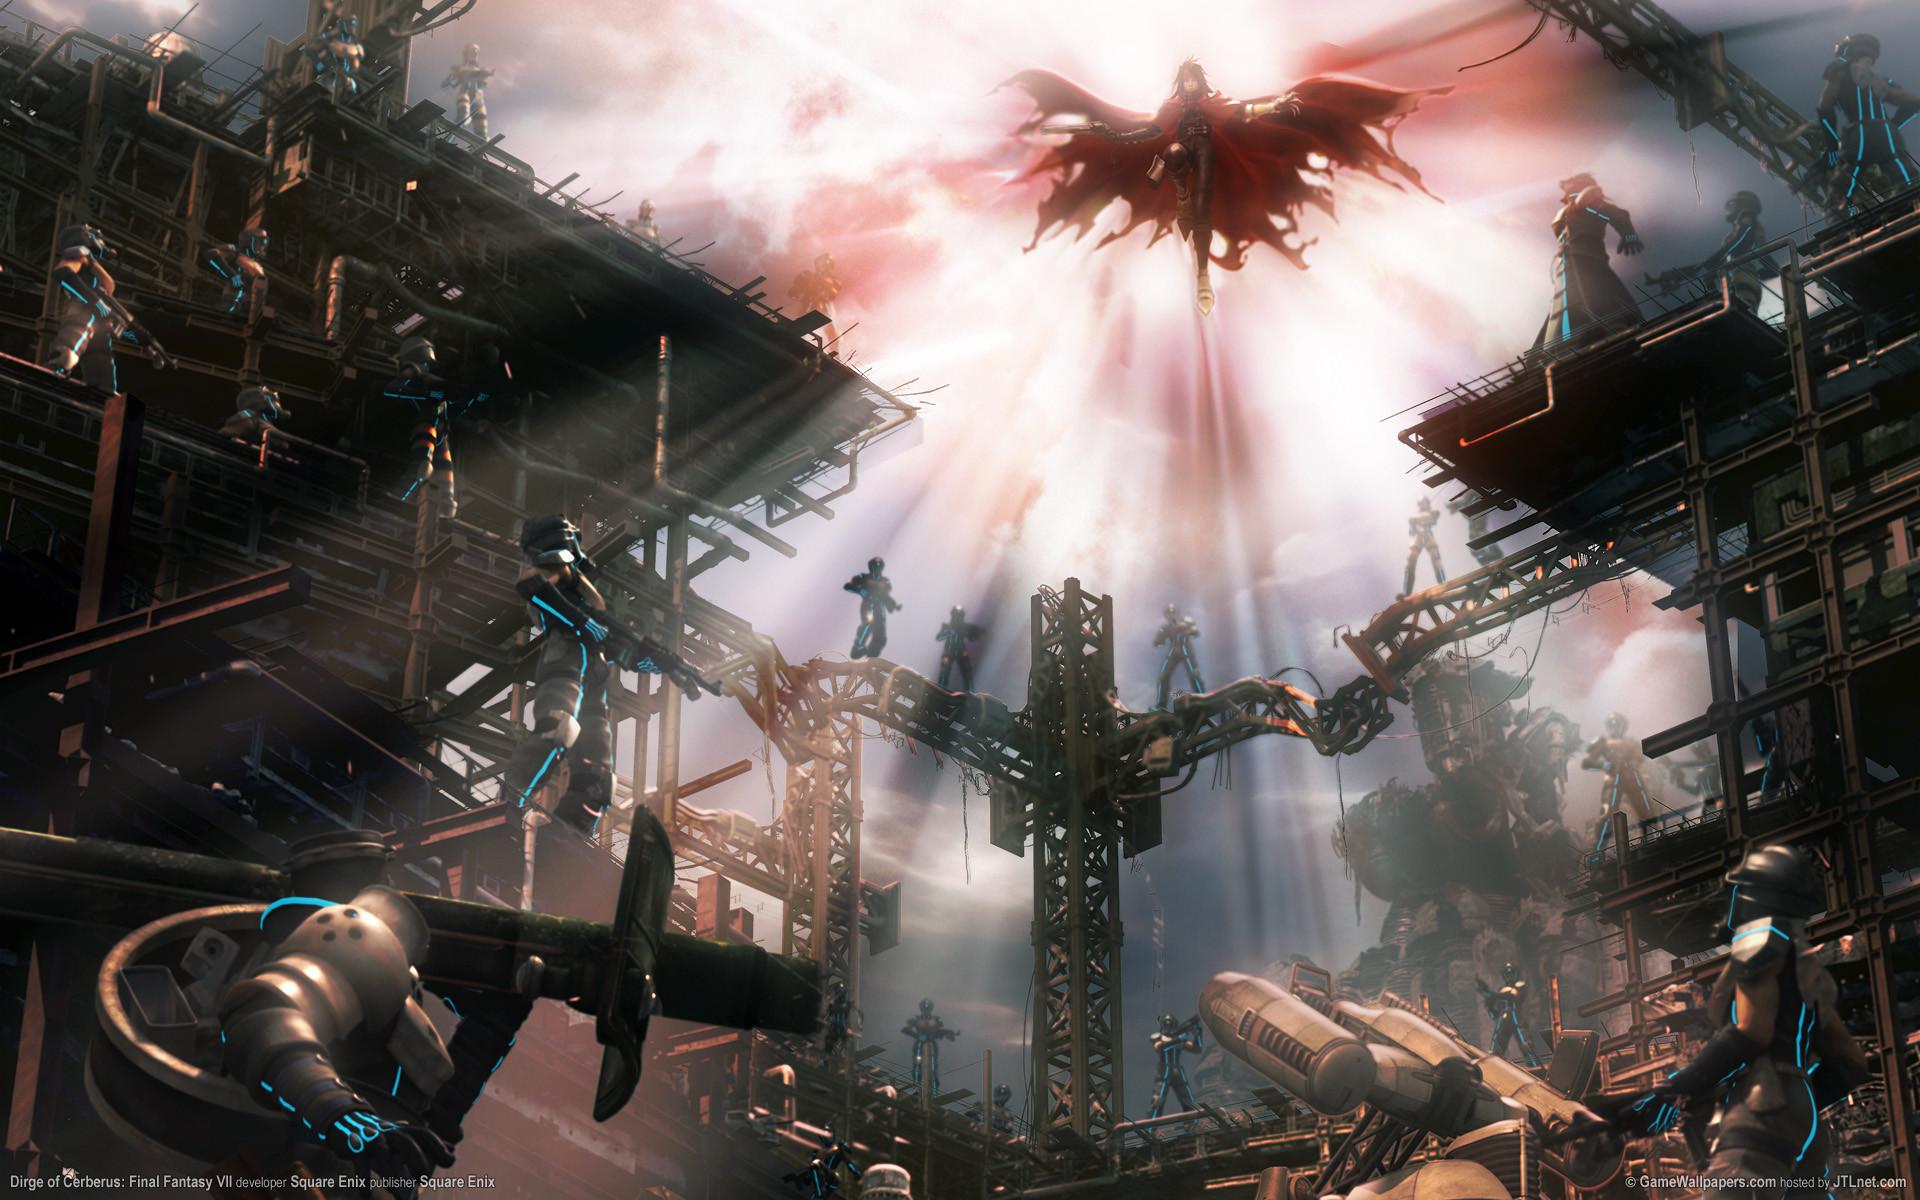 Final Fantasy HD Wallpaper Wallpapers Wallpapers